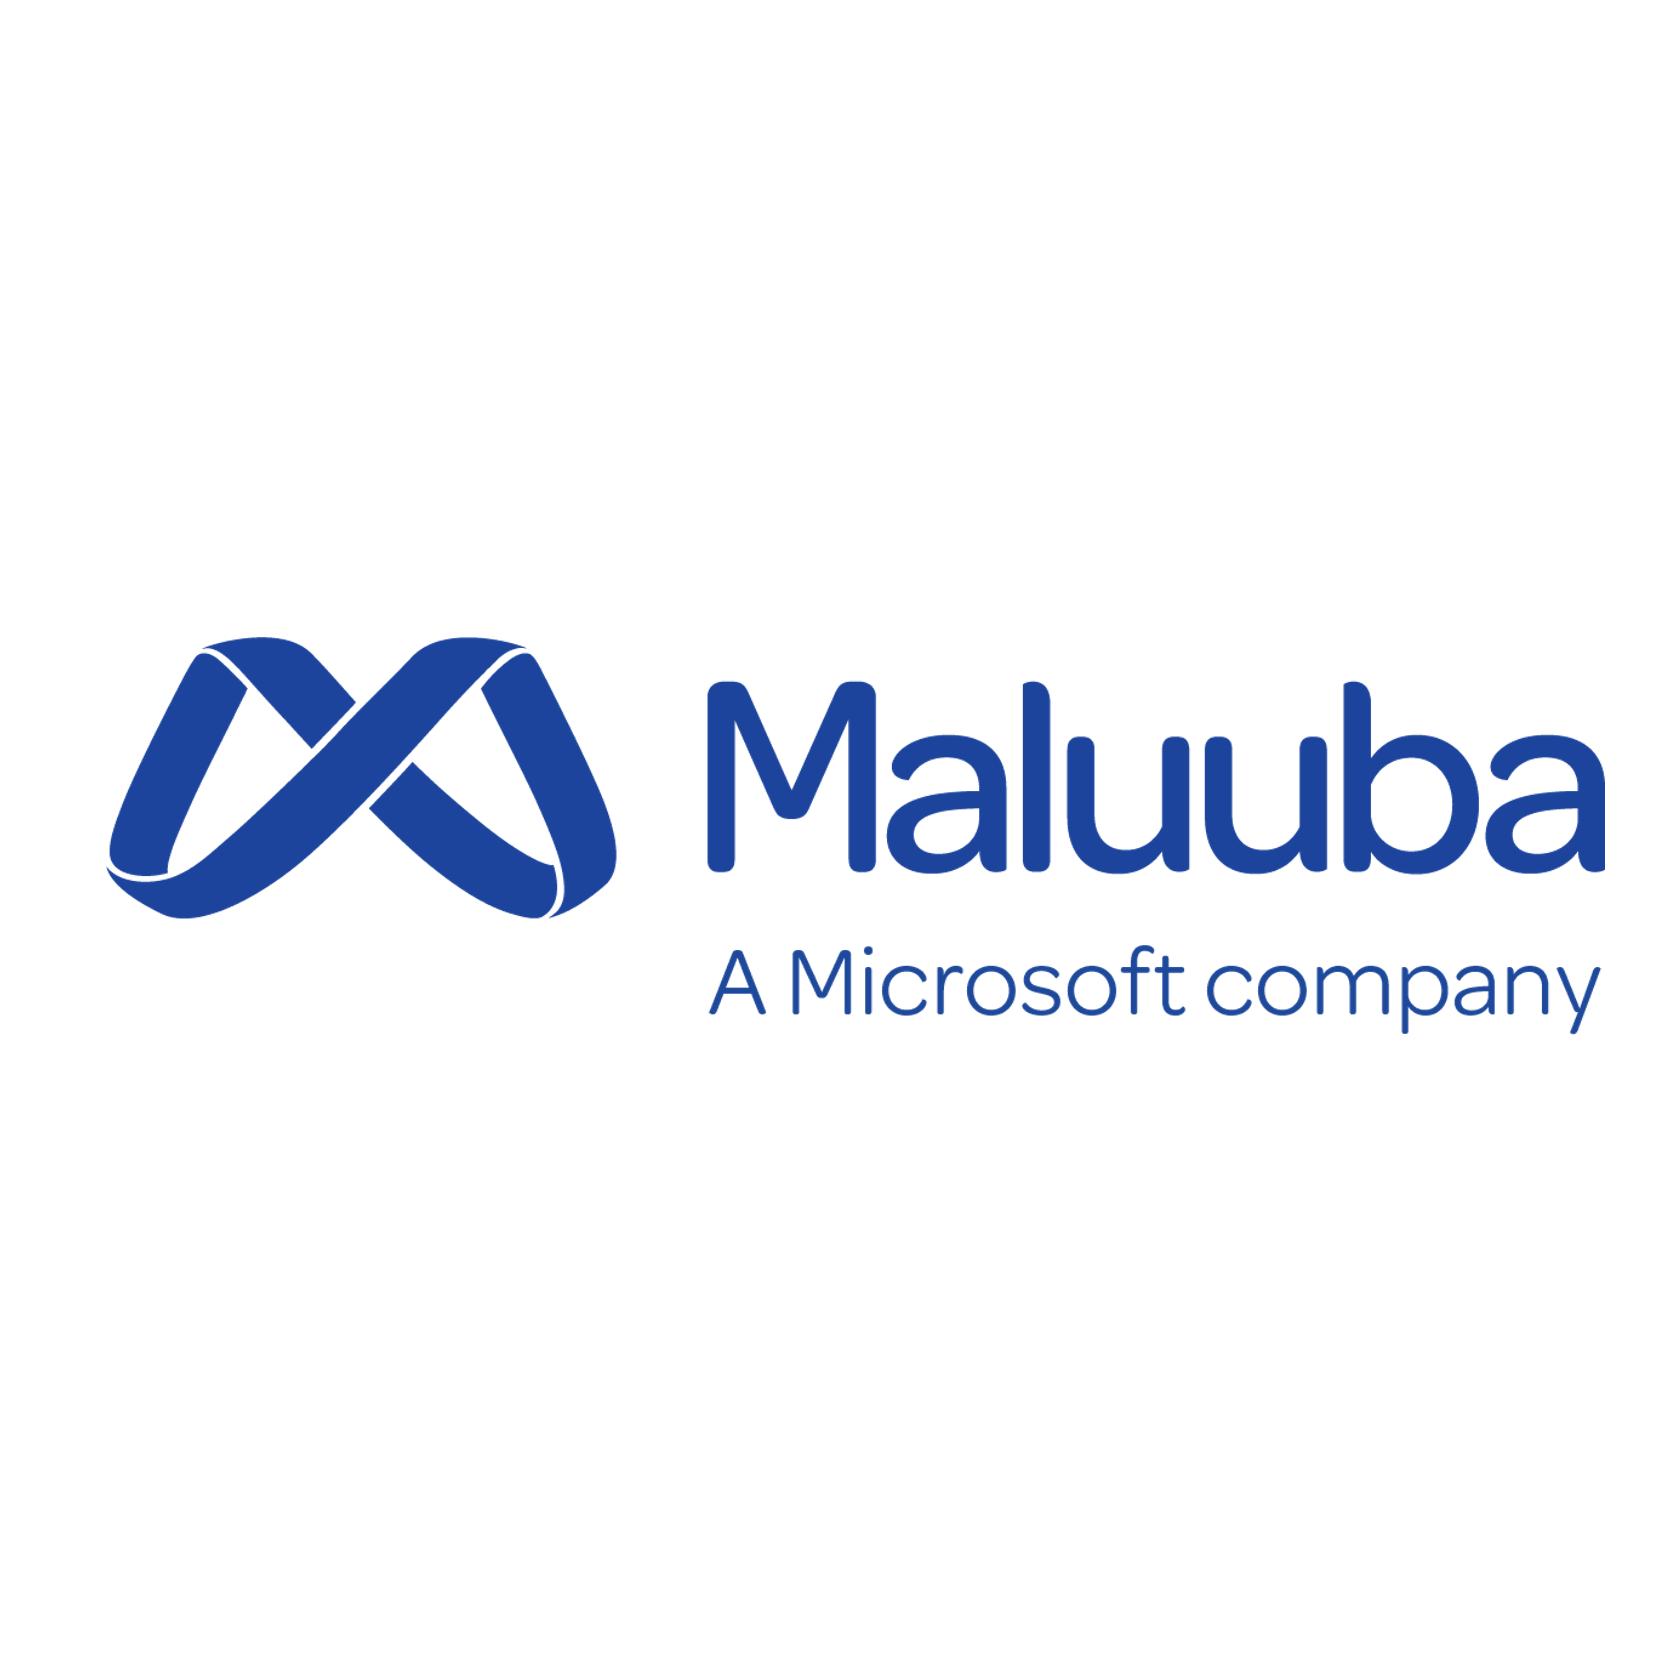 Maluuba Logo